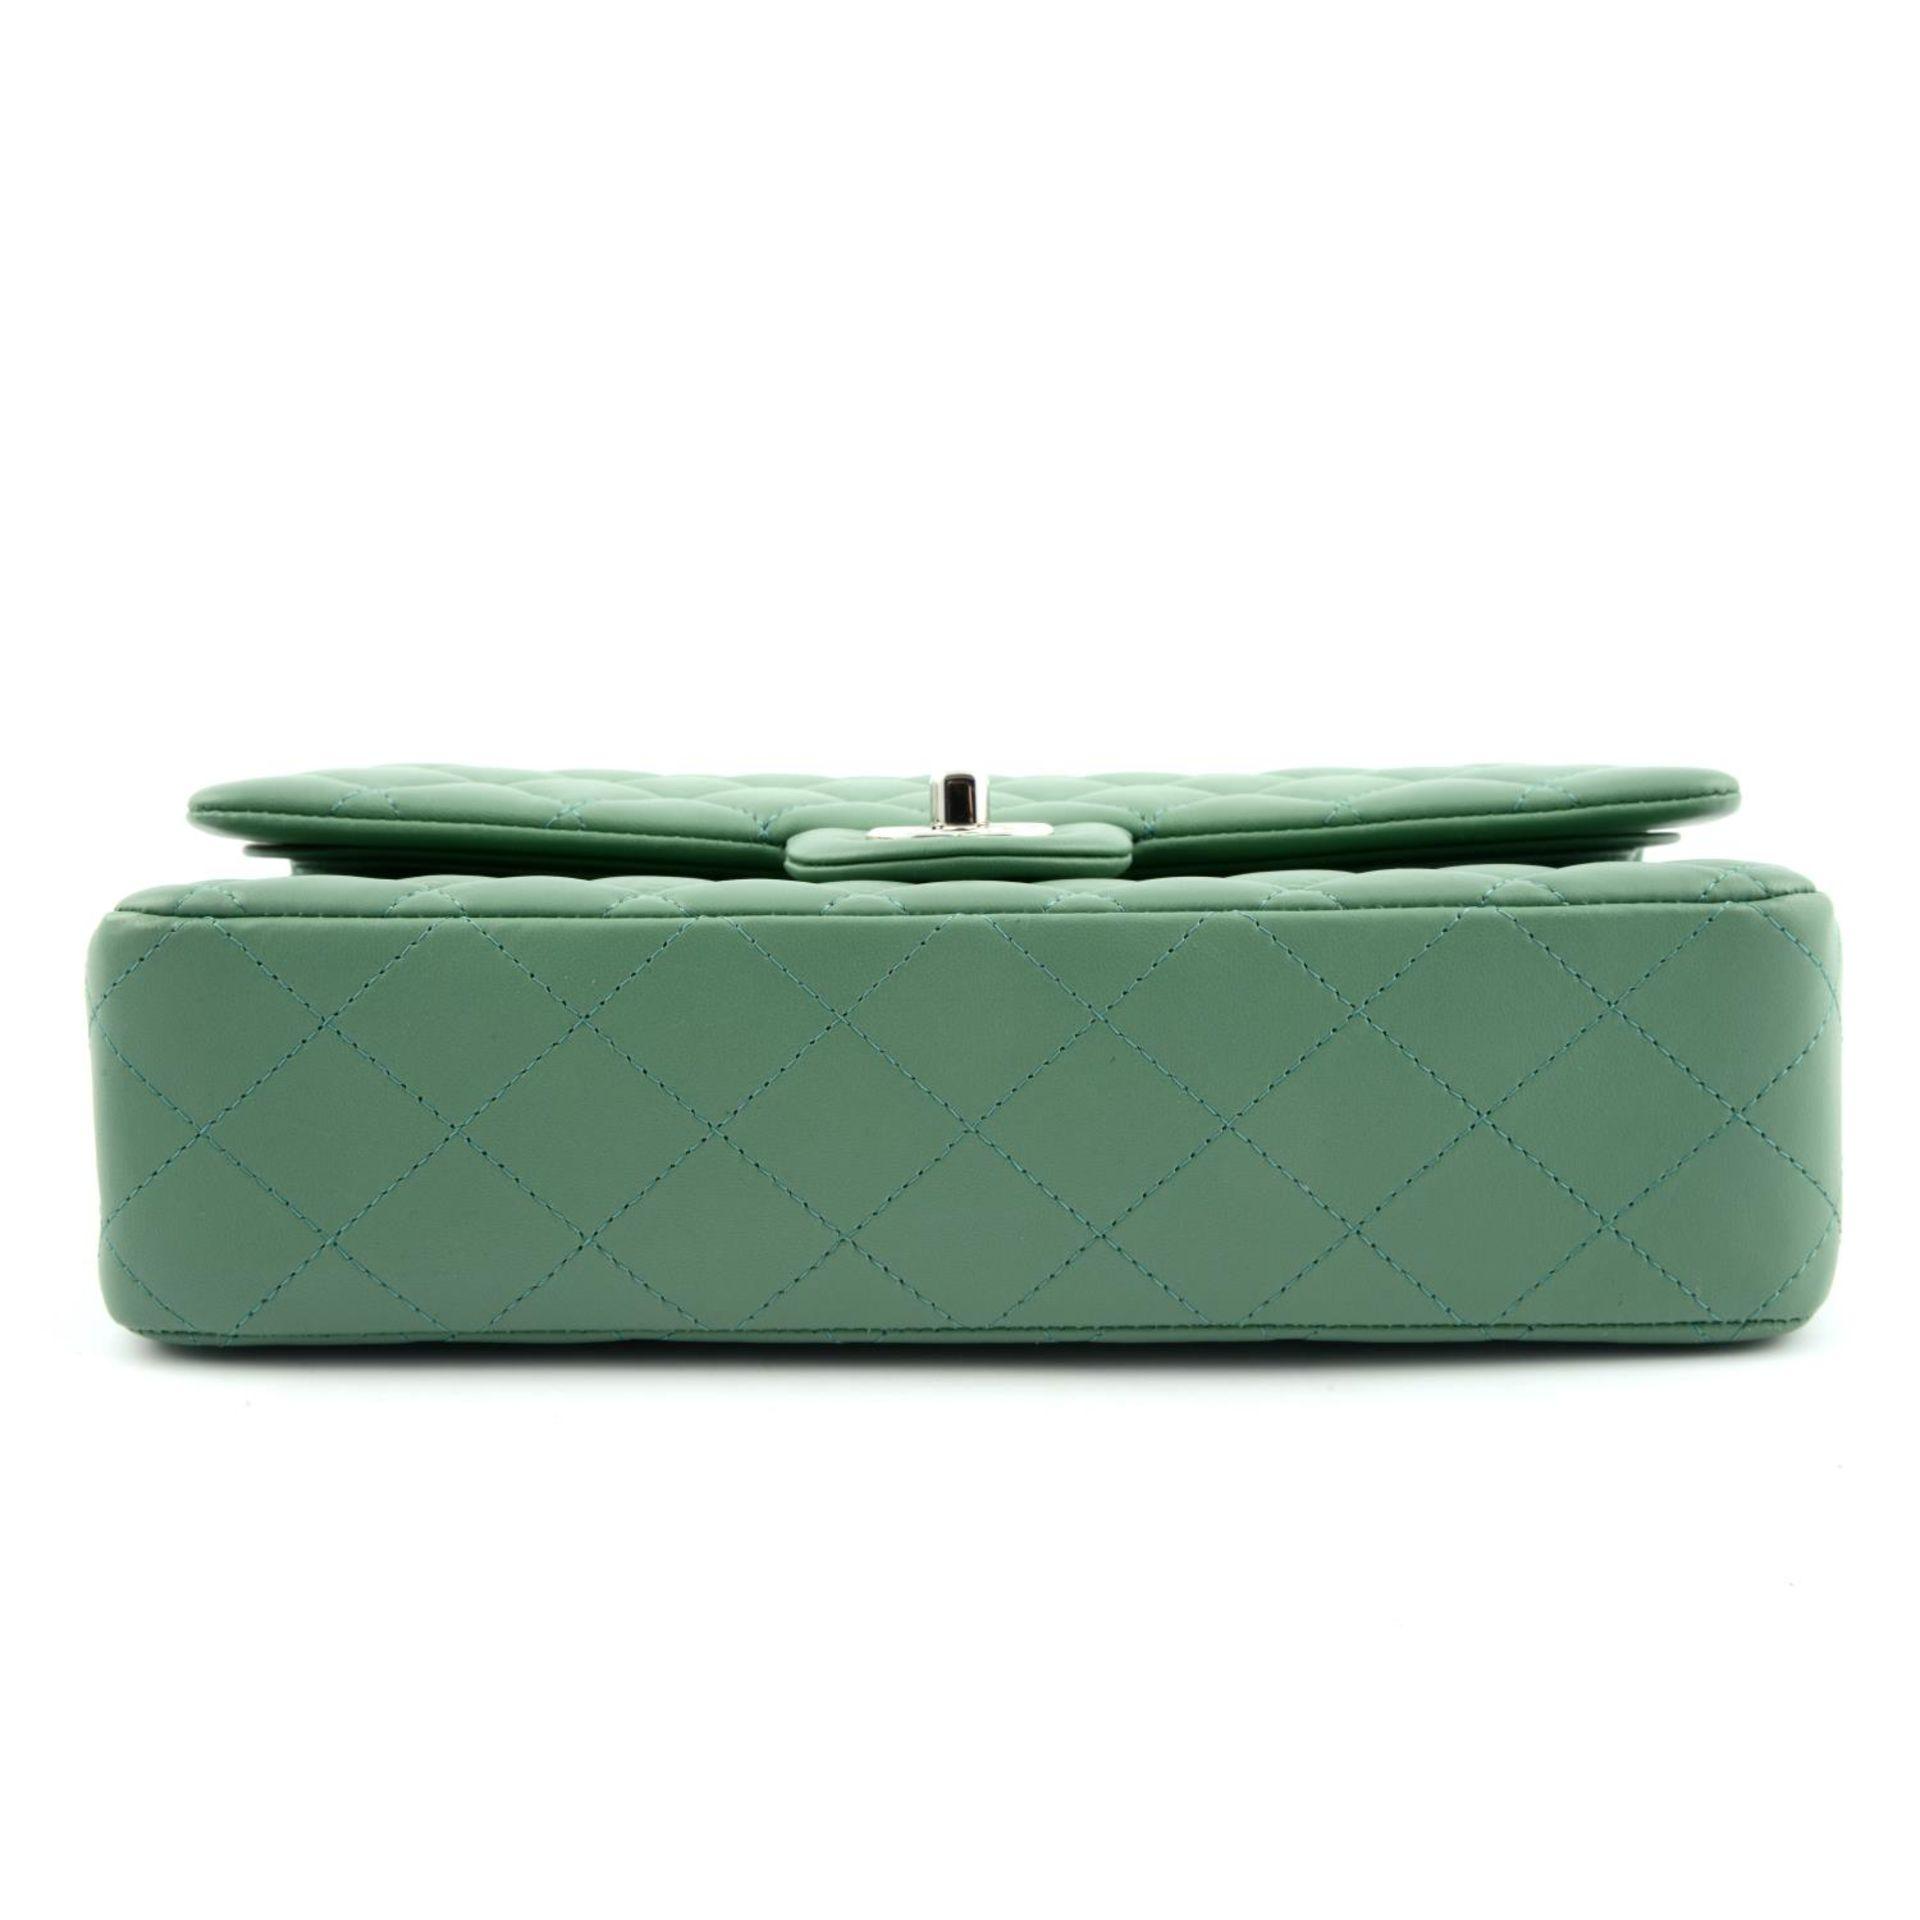 CHANEL - a green medium classic double flap handbag. - Image 5 of 7